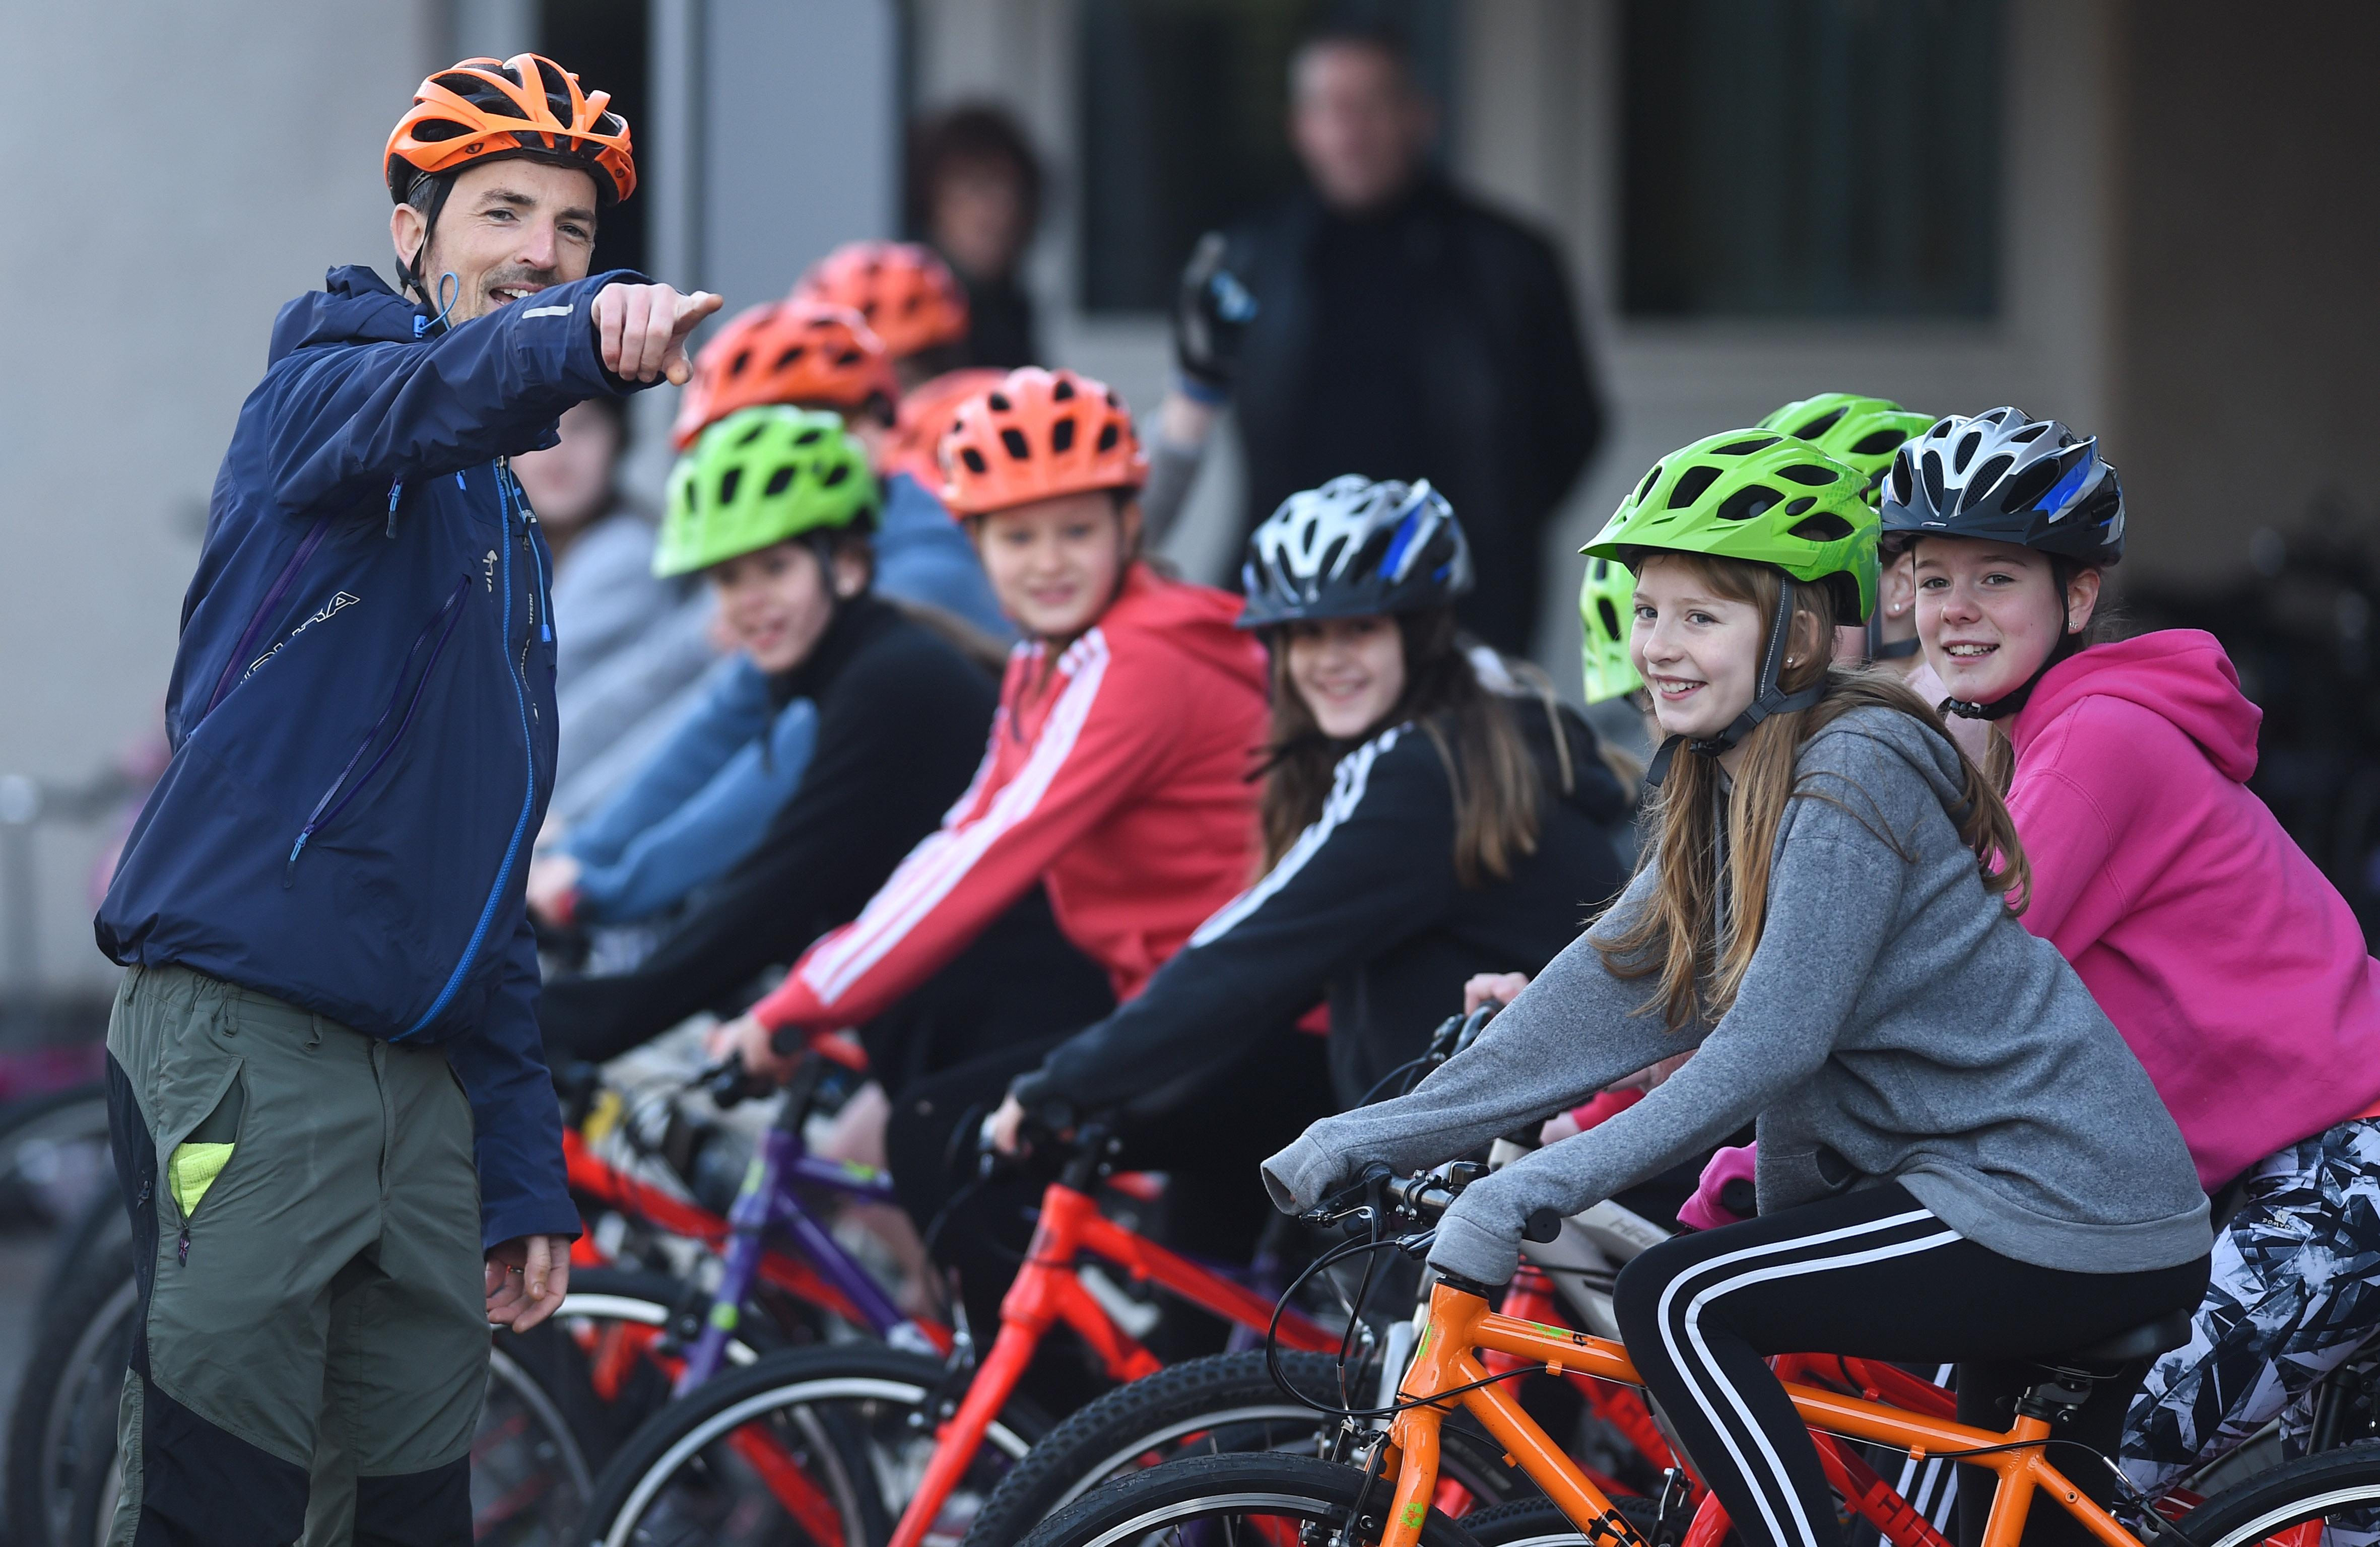 Pupils and I Bike officer enjoying cycling skills lesson